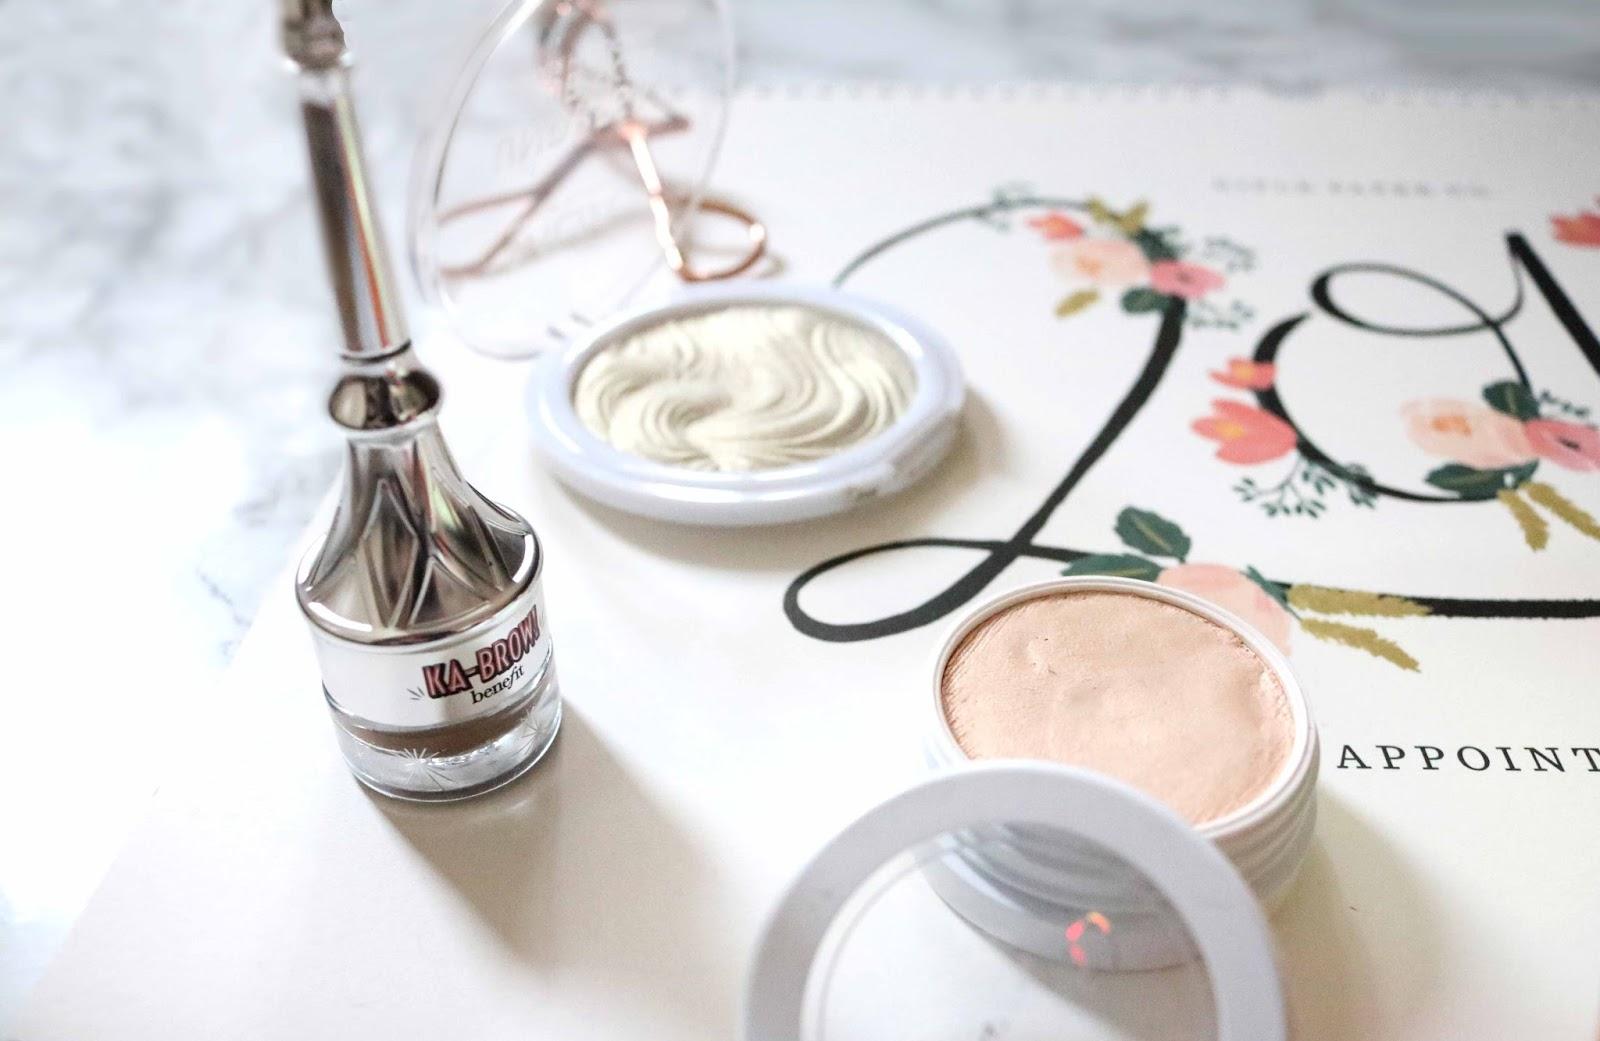 best of, round up, 2016, beauty, skincare, products, nyx, Colourpop, benefit, stila, mua, highlighter, liquid lipsticks, Pixi,